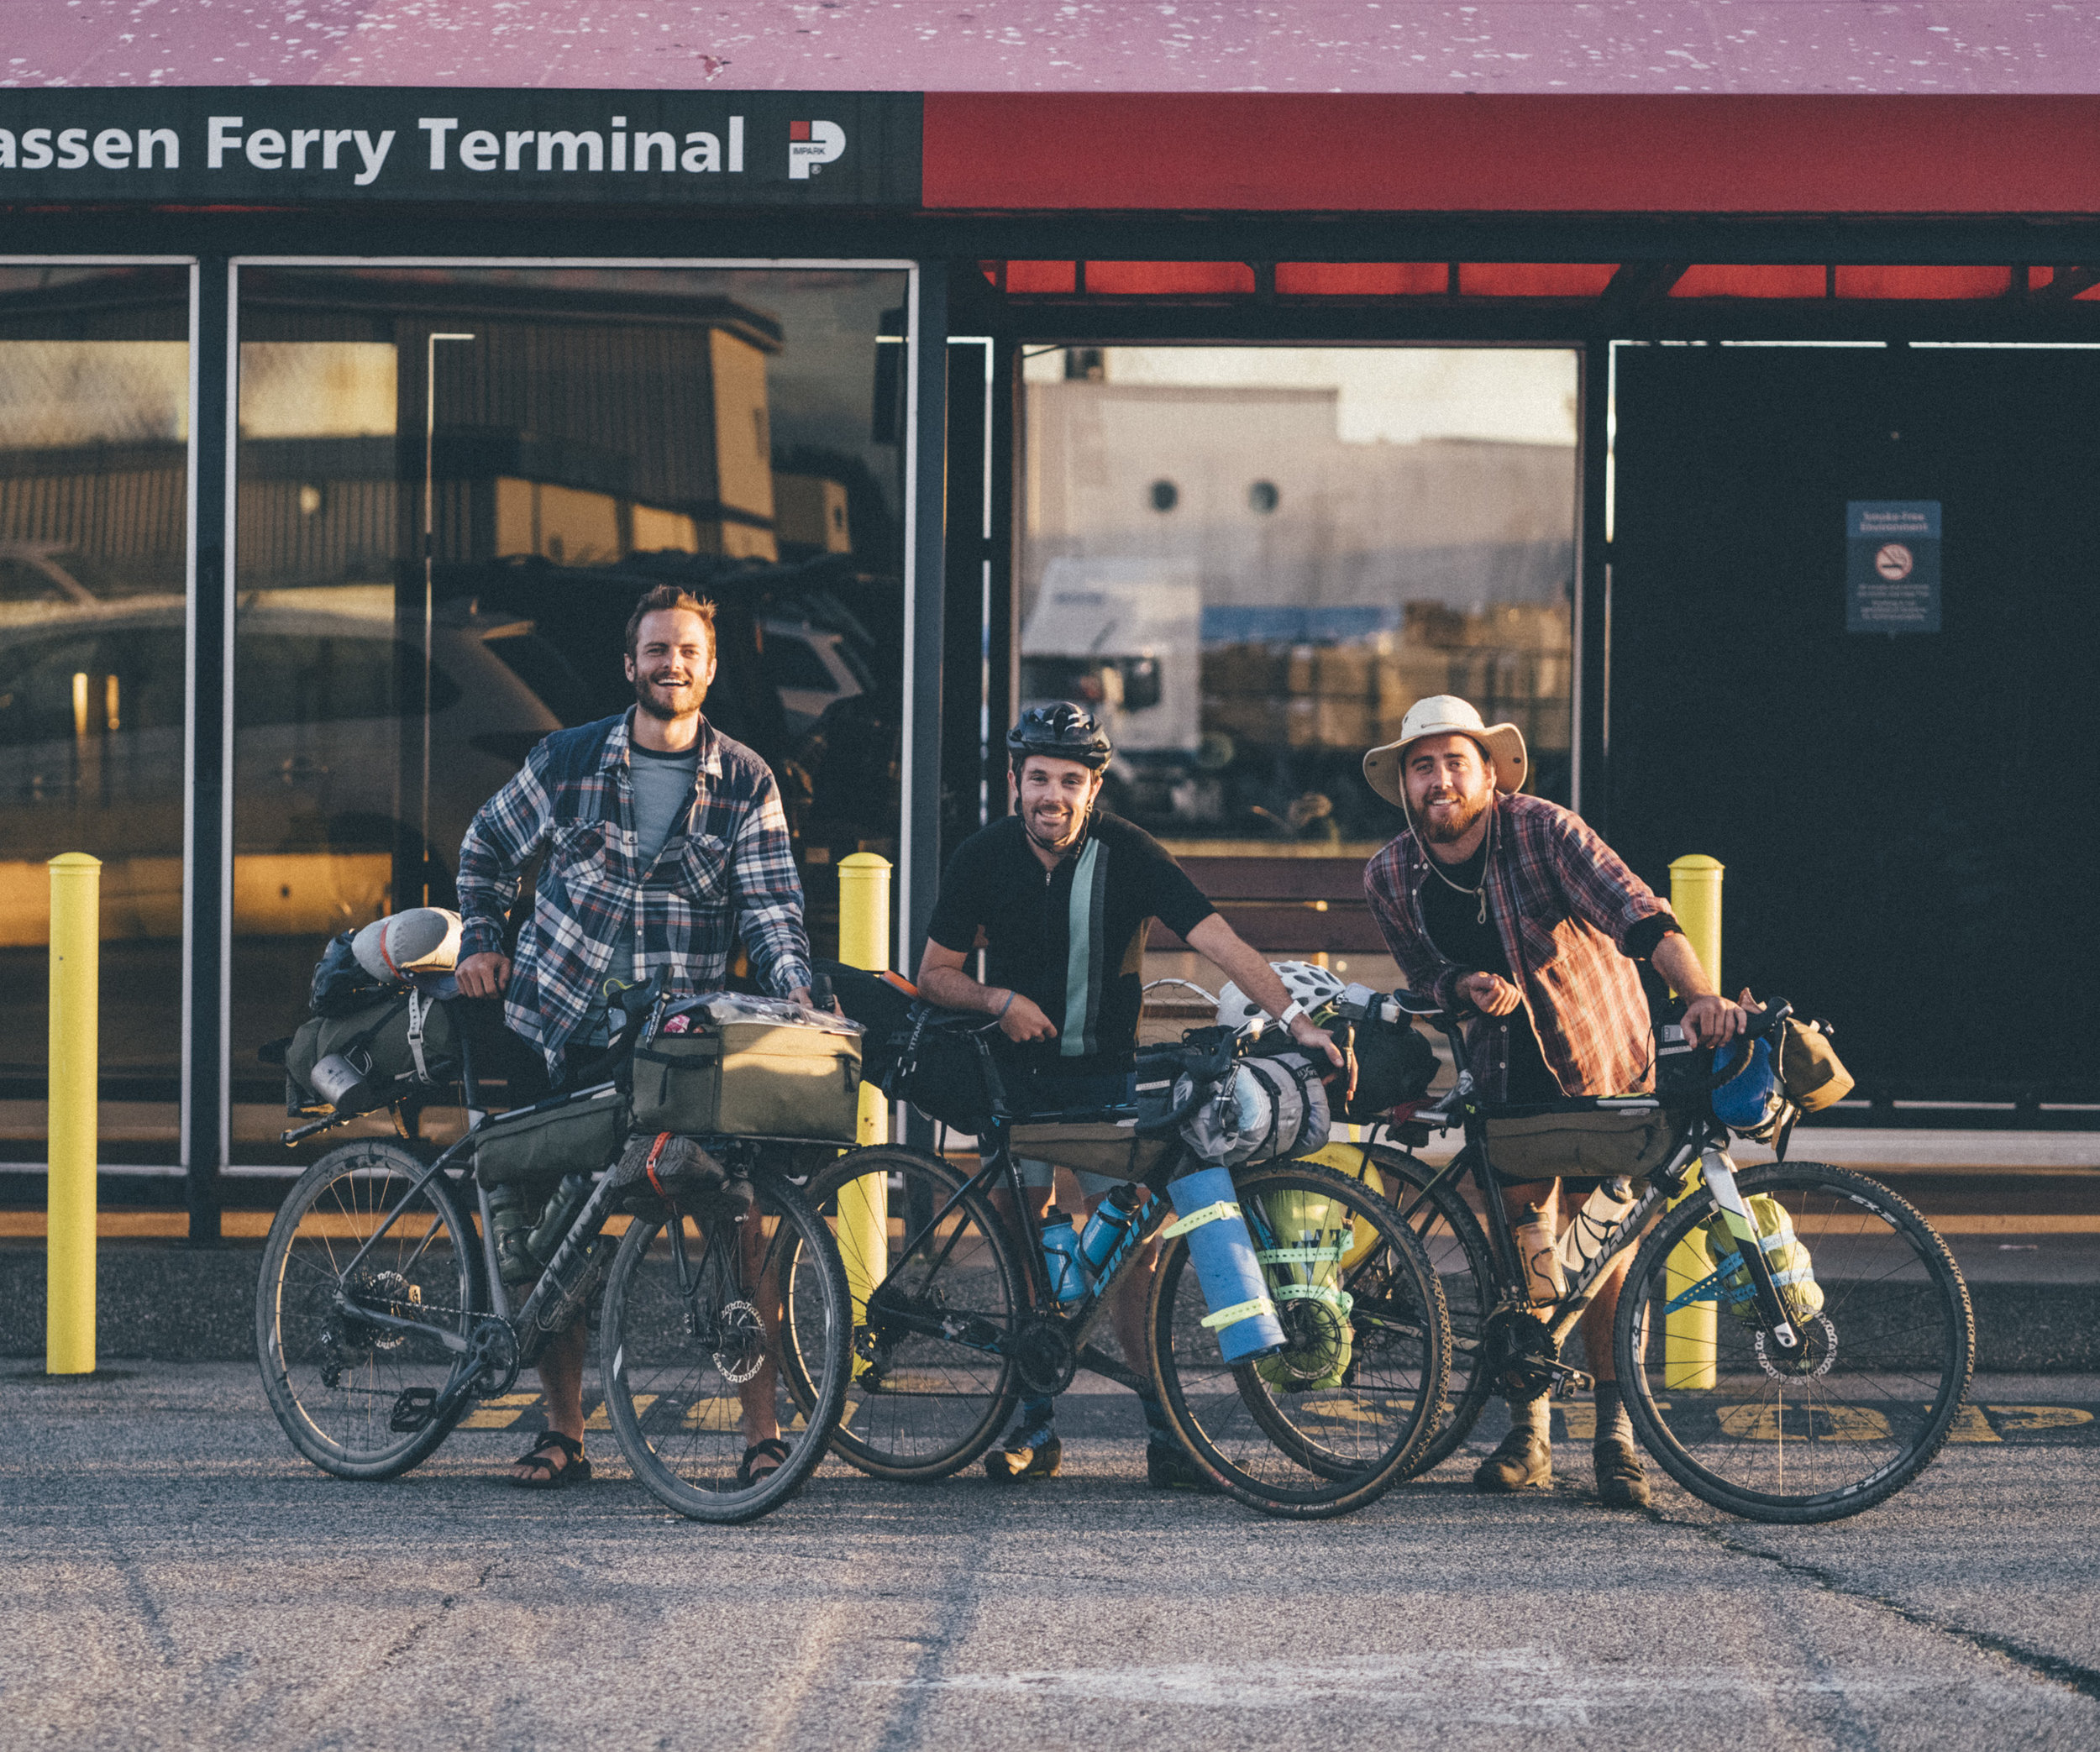 Bikepacking-VanIsland-JohnsonStudios-201806-293.jpg